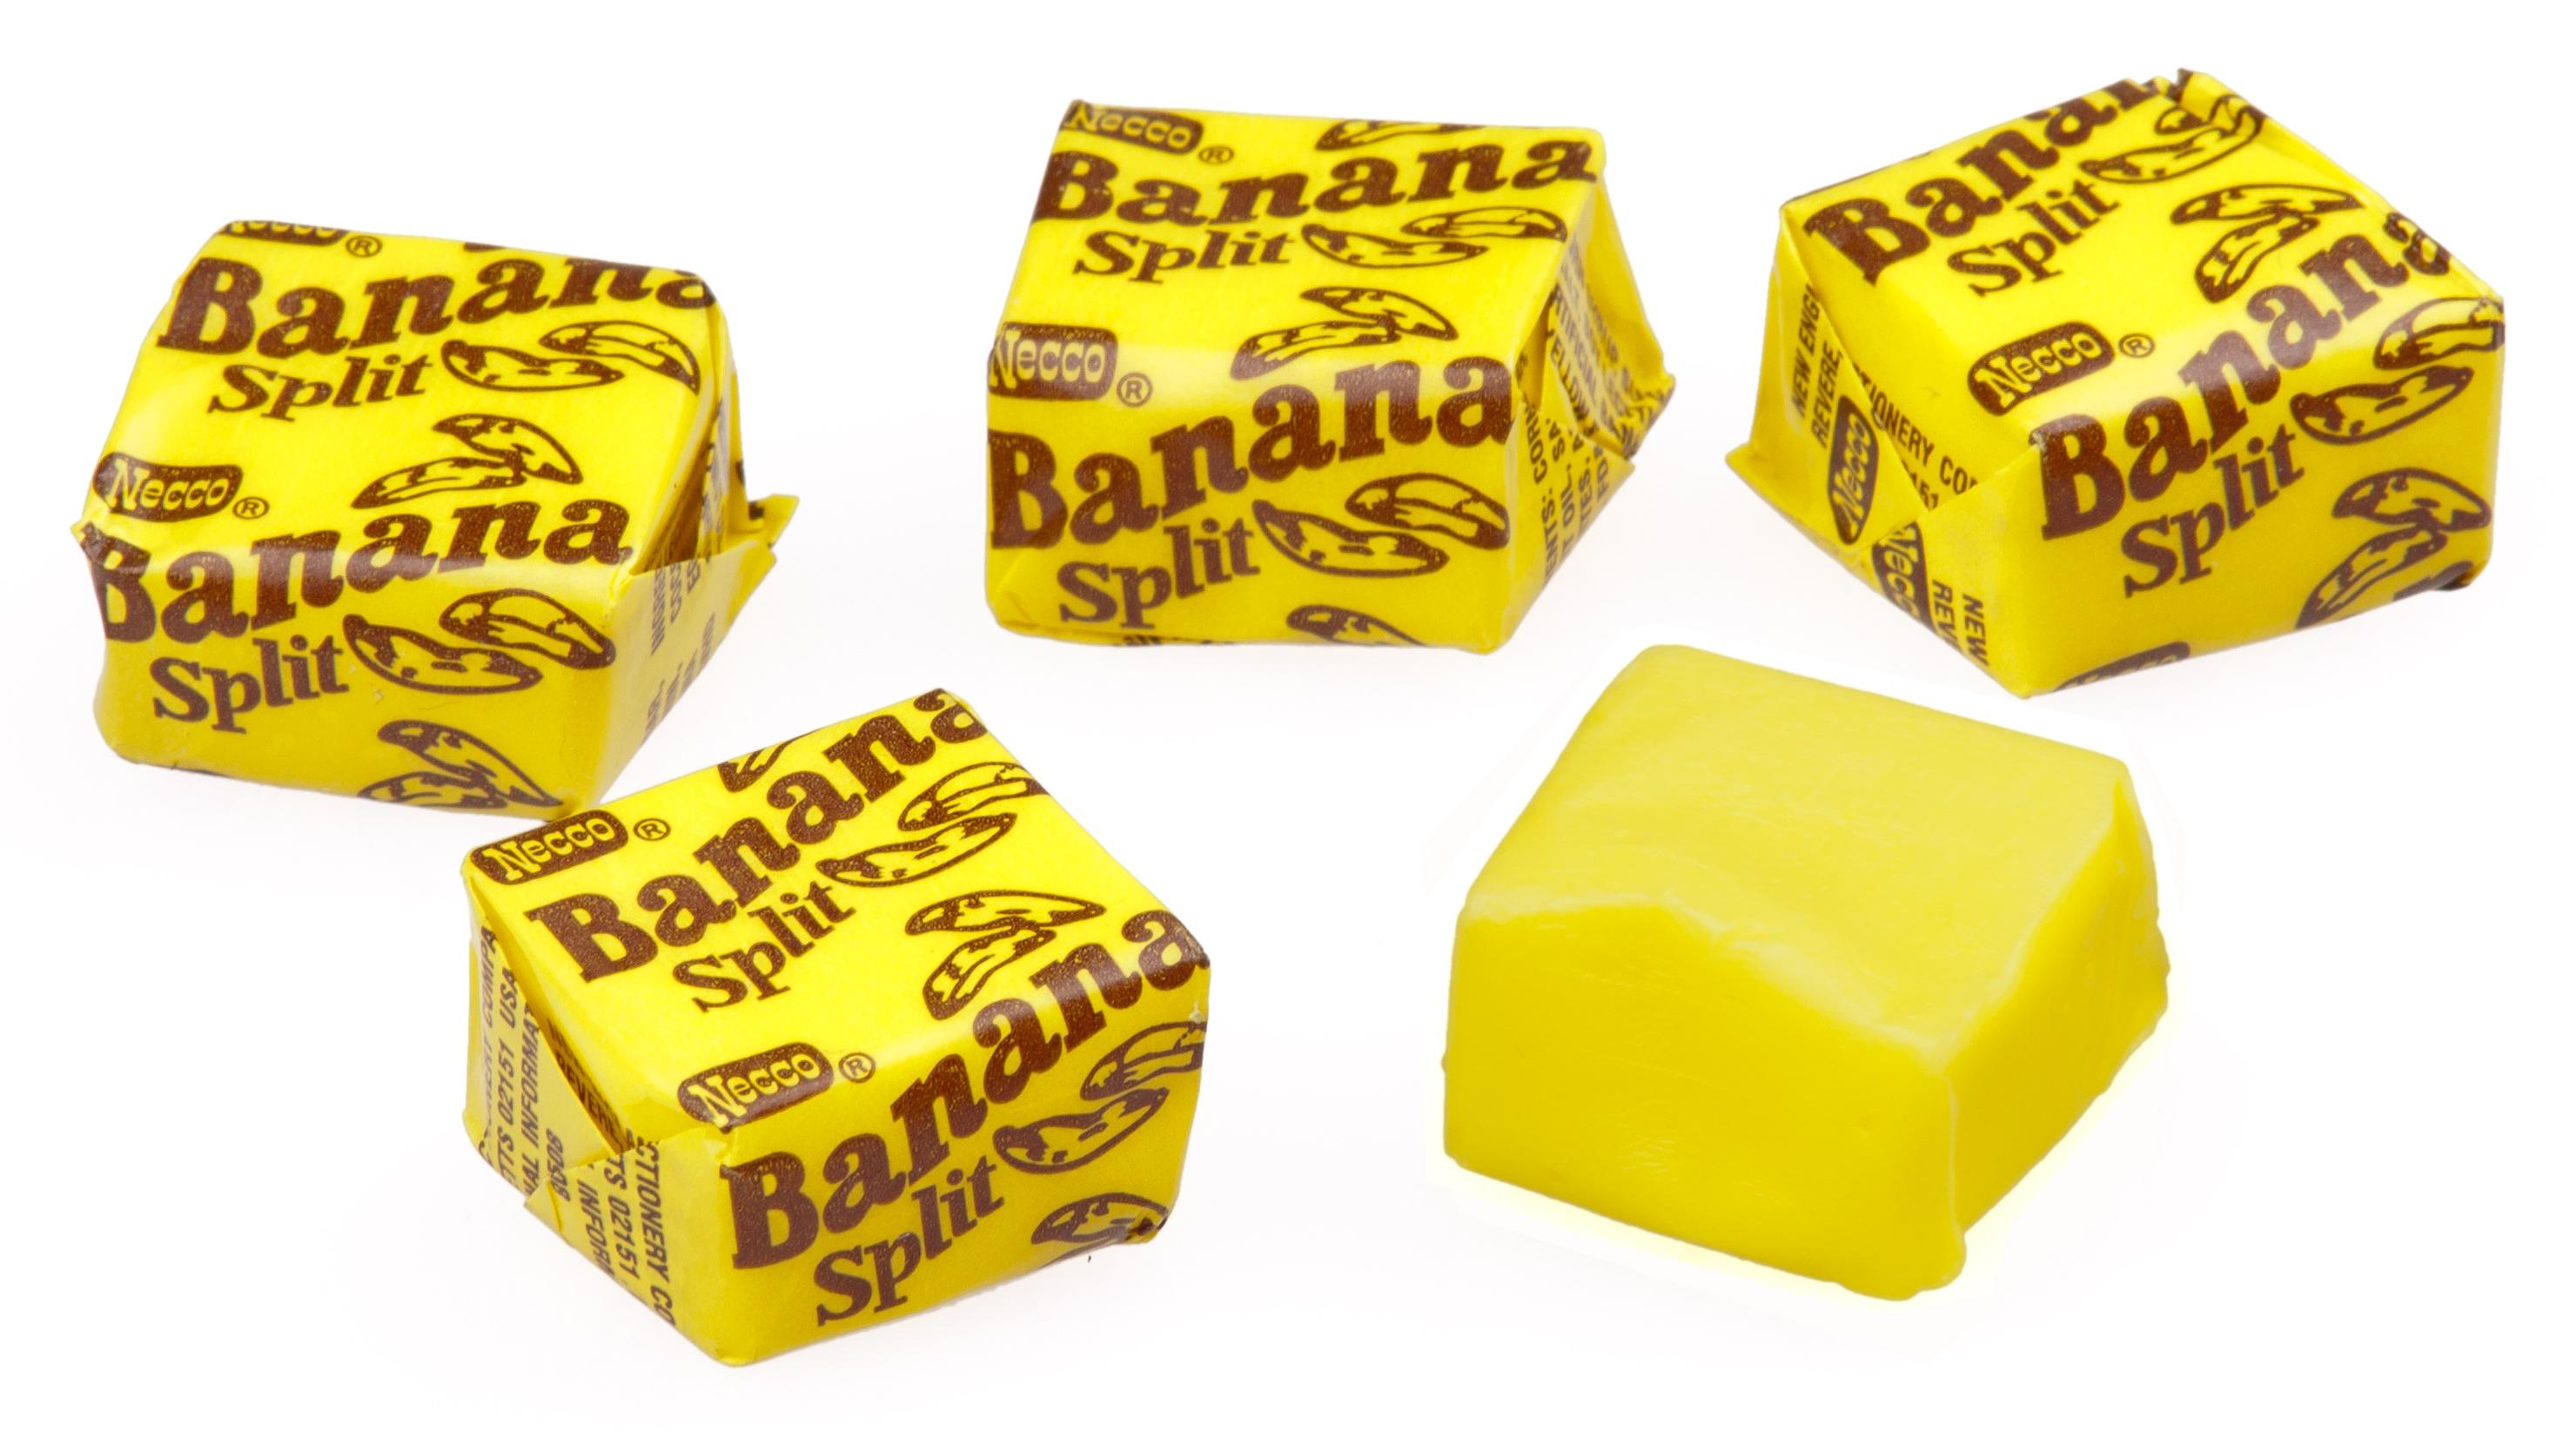 Kostenlose foto : süß, Erholung, Lebensmittel, Gelb, Banane, Snack ...